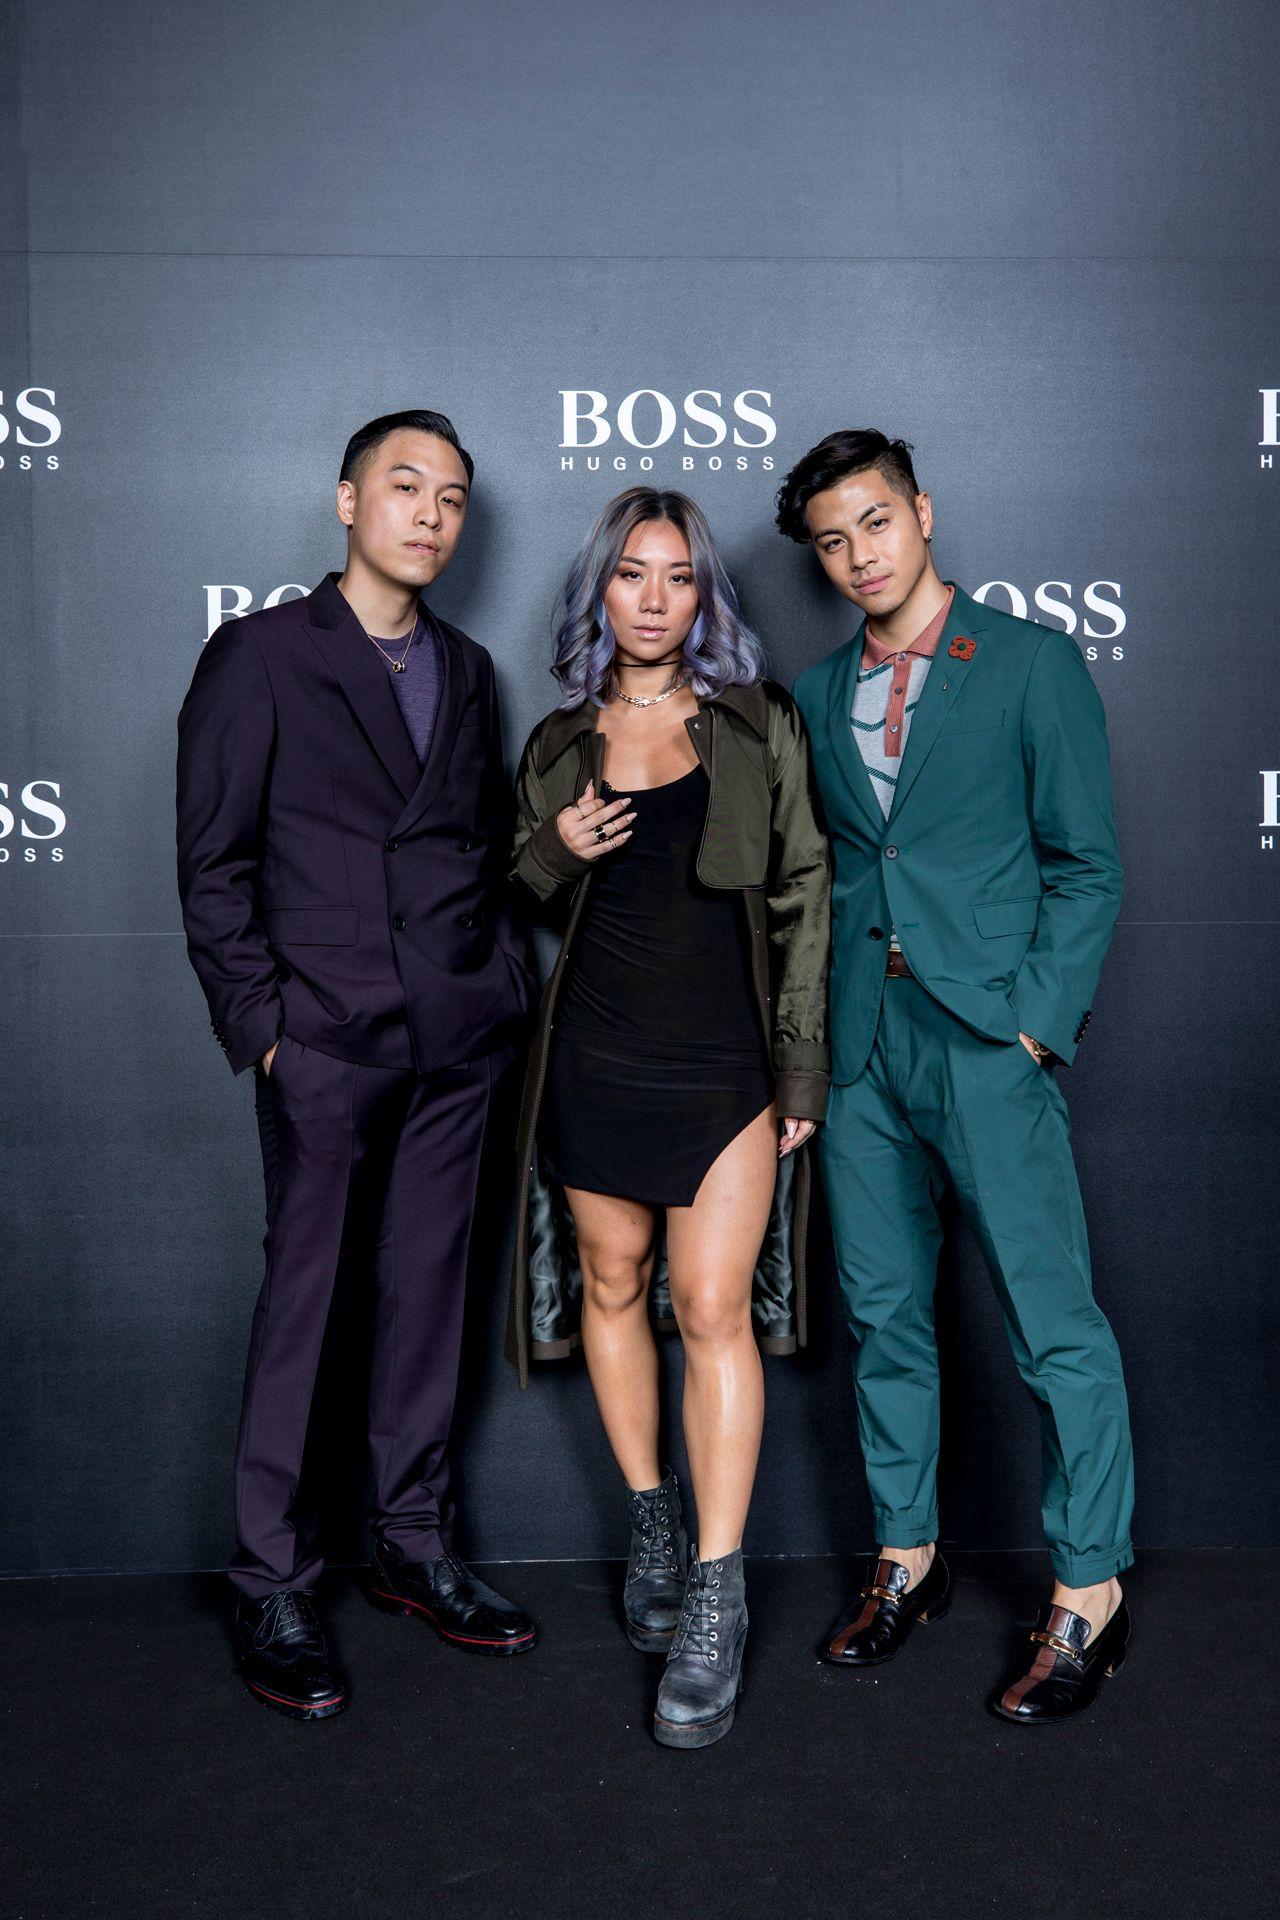 Jonathan Chua, Sandra Riley Teng, and Benjamin Kheng in BOSS